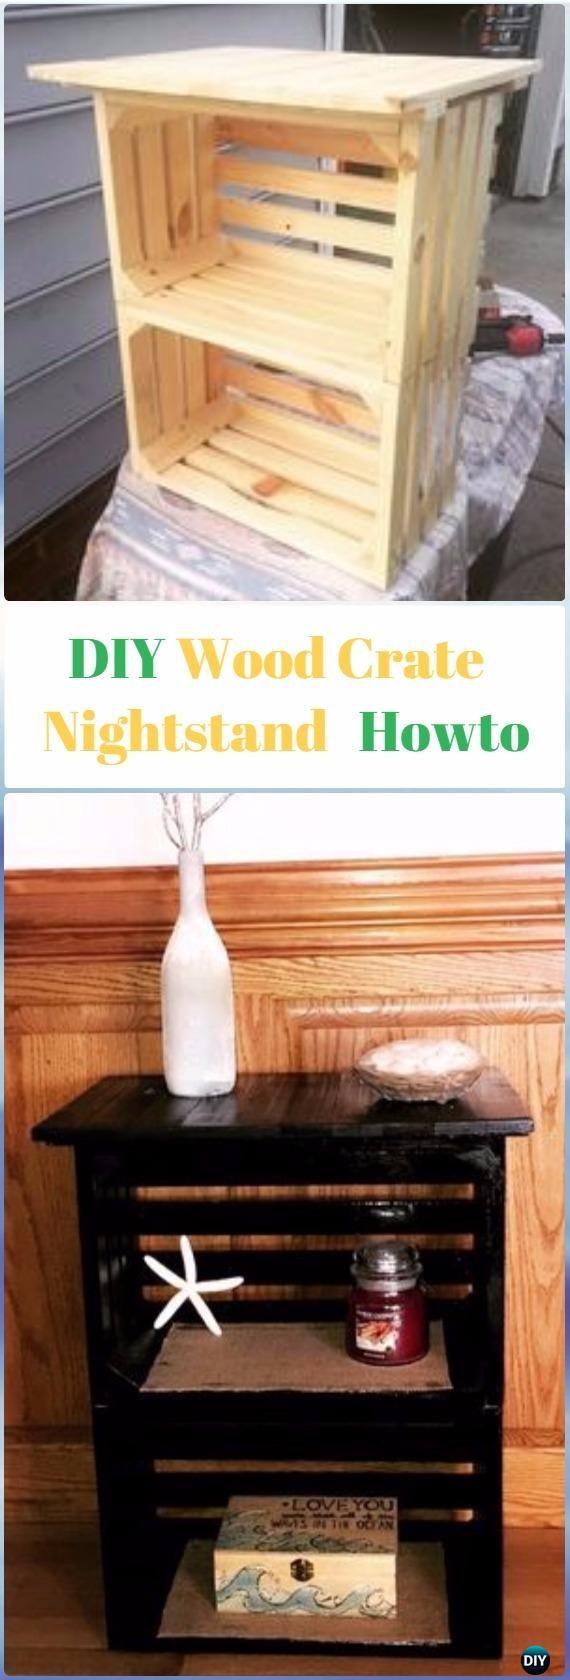 Diy Wood Crate Nightstand Instructions Video Diy Wood Crate  # Muebles Faciles Liniers